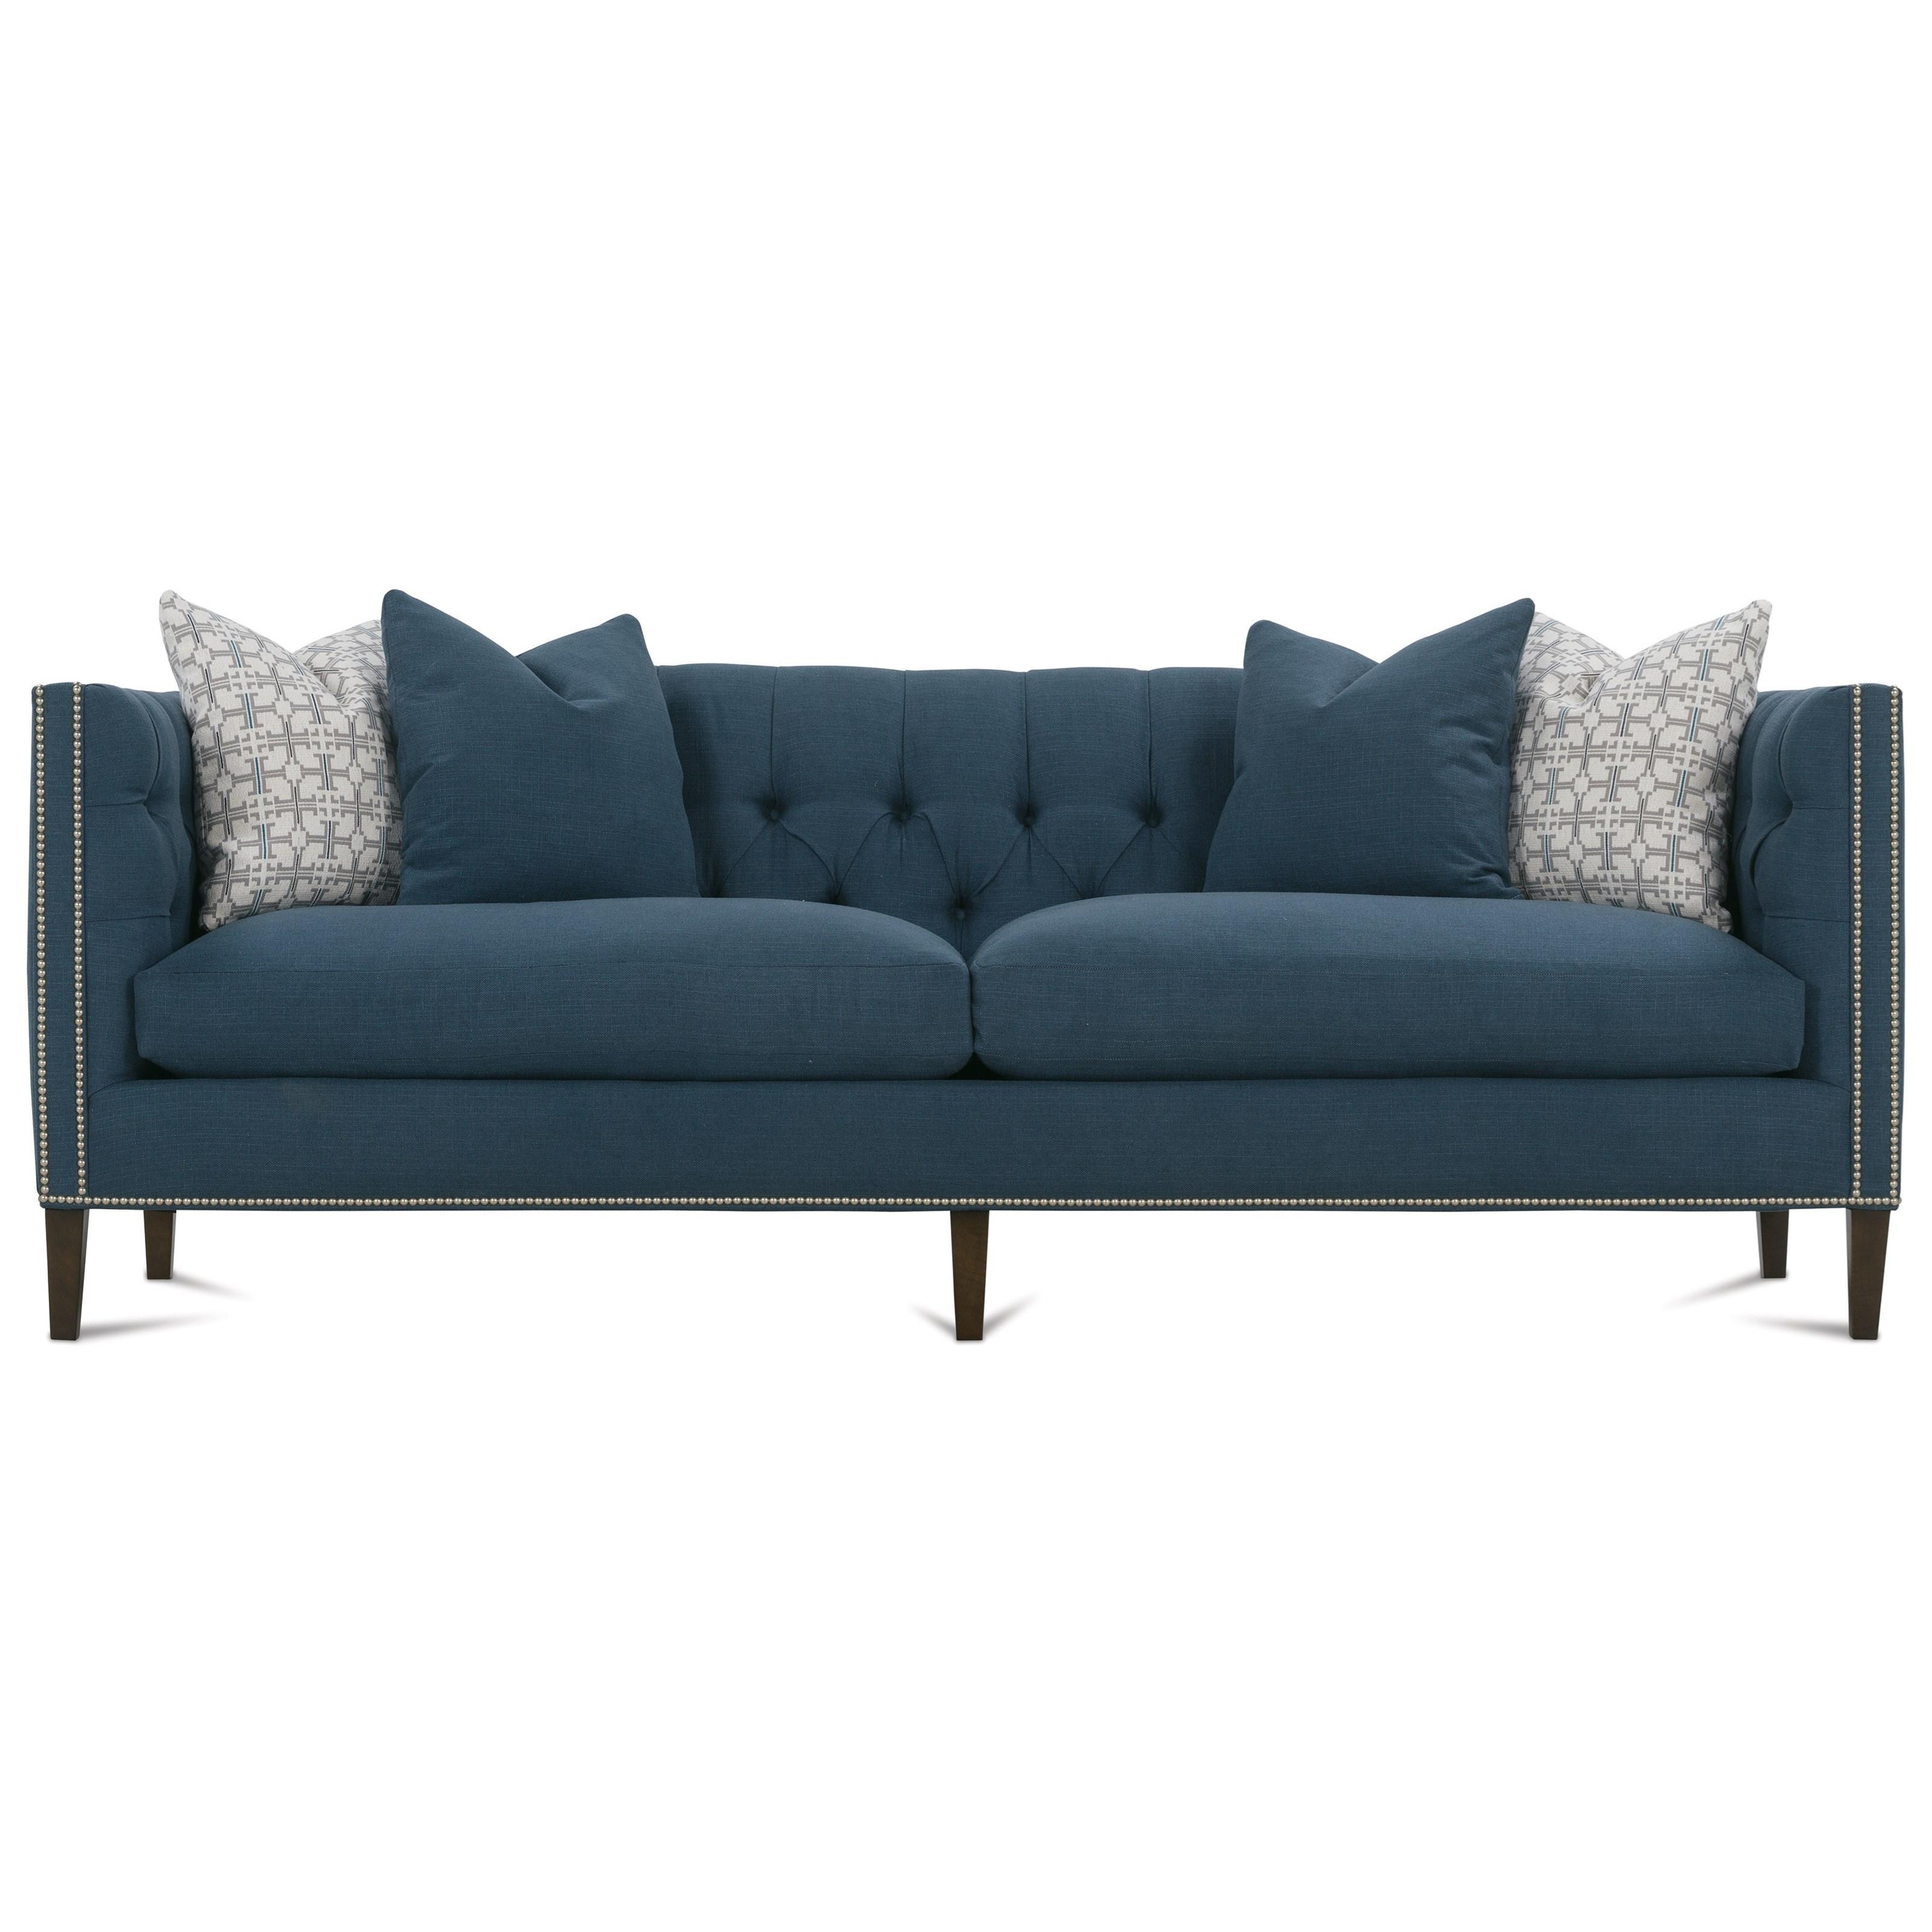 Robin Bruce Brette2 Cushion Sofa ...